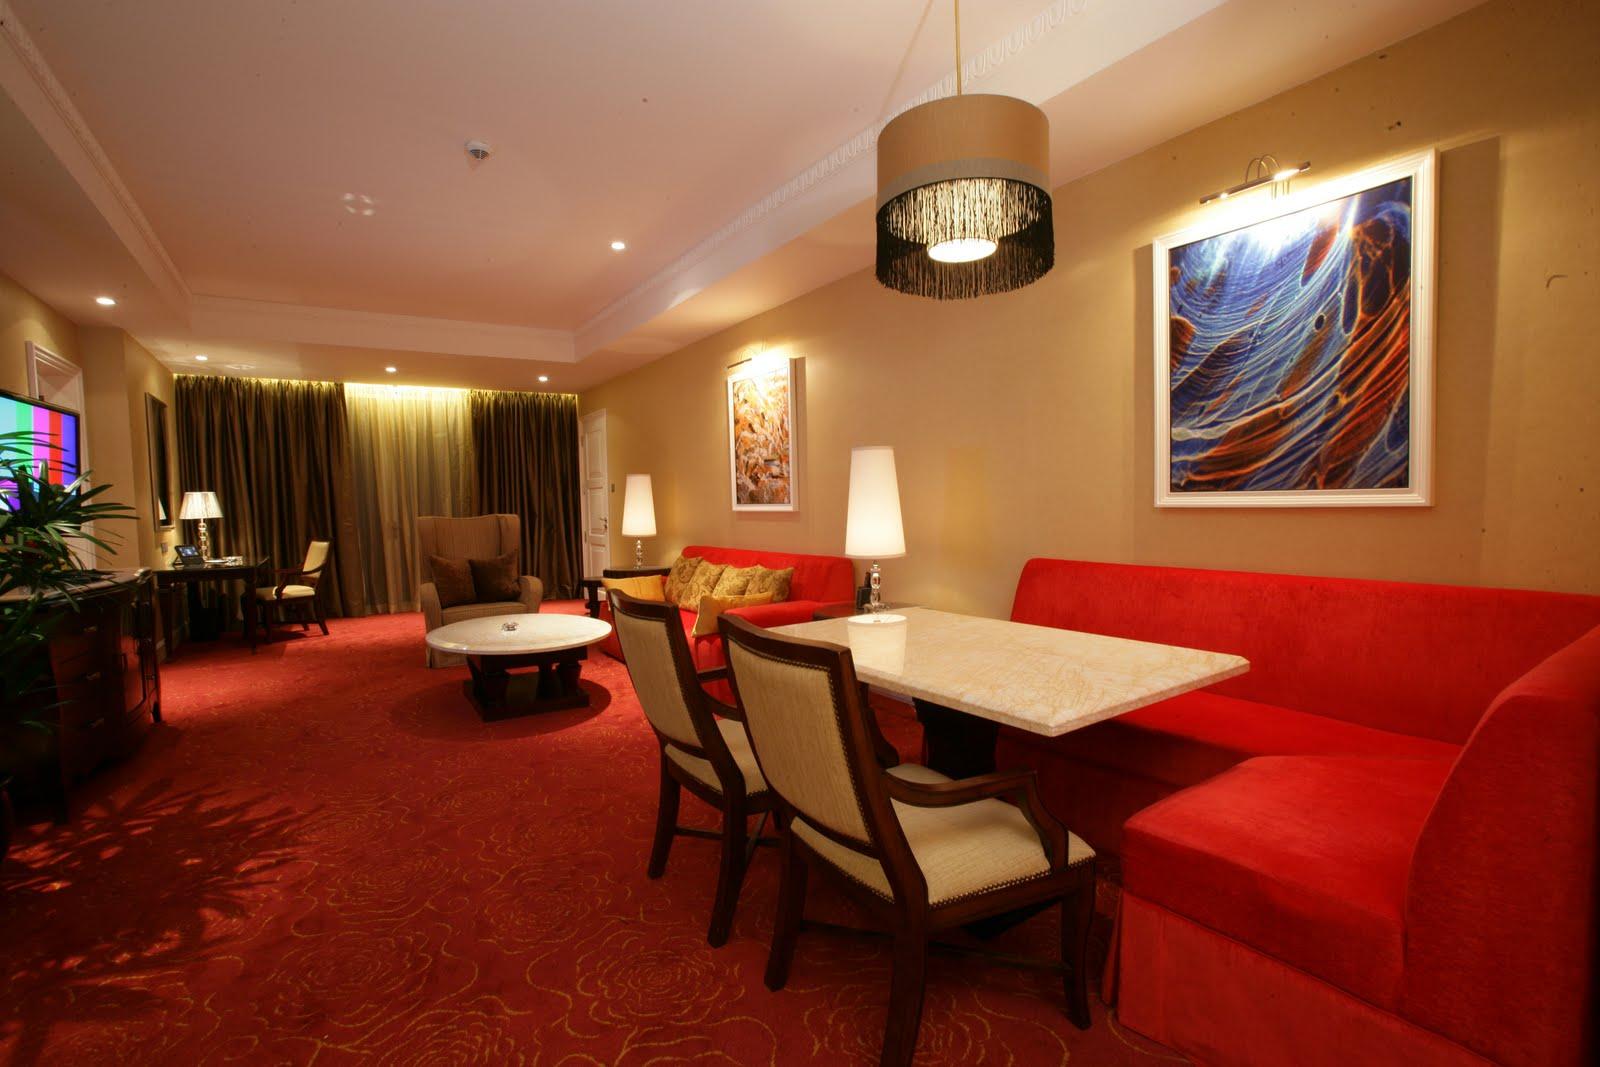 Maxims Hotel At Resorts World Manila: The Only Six-Star